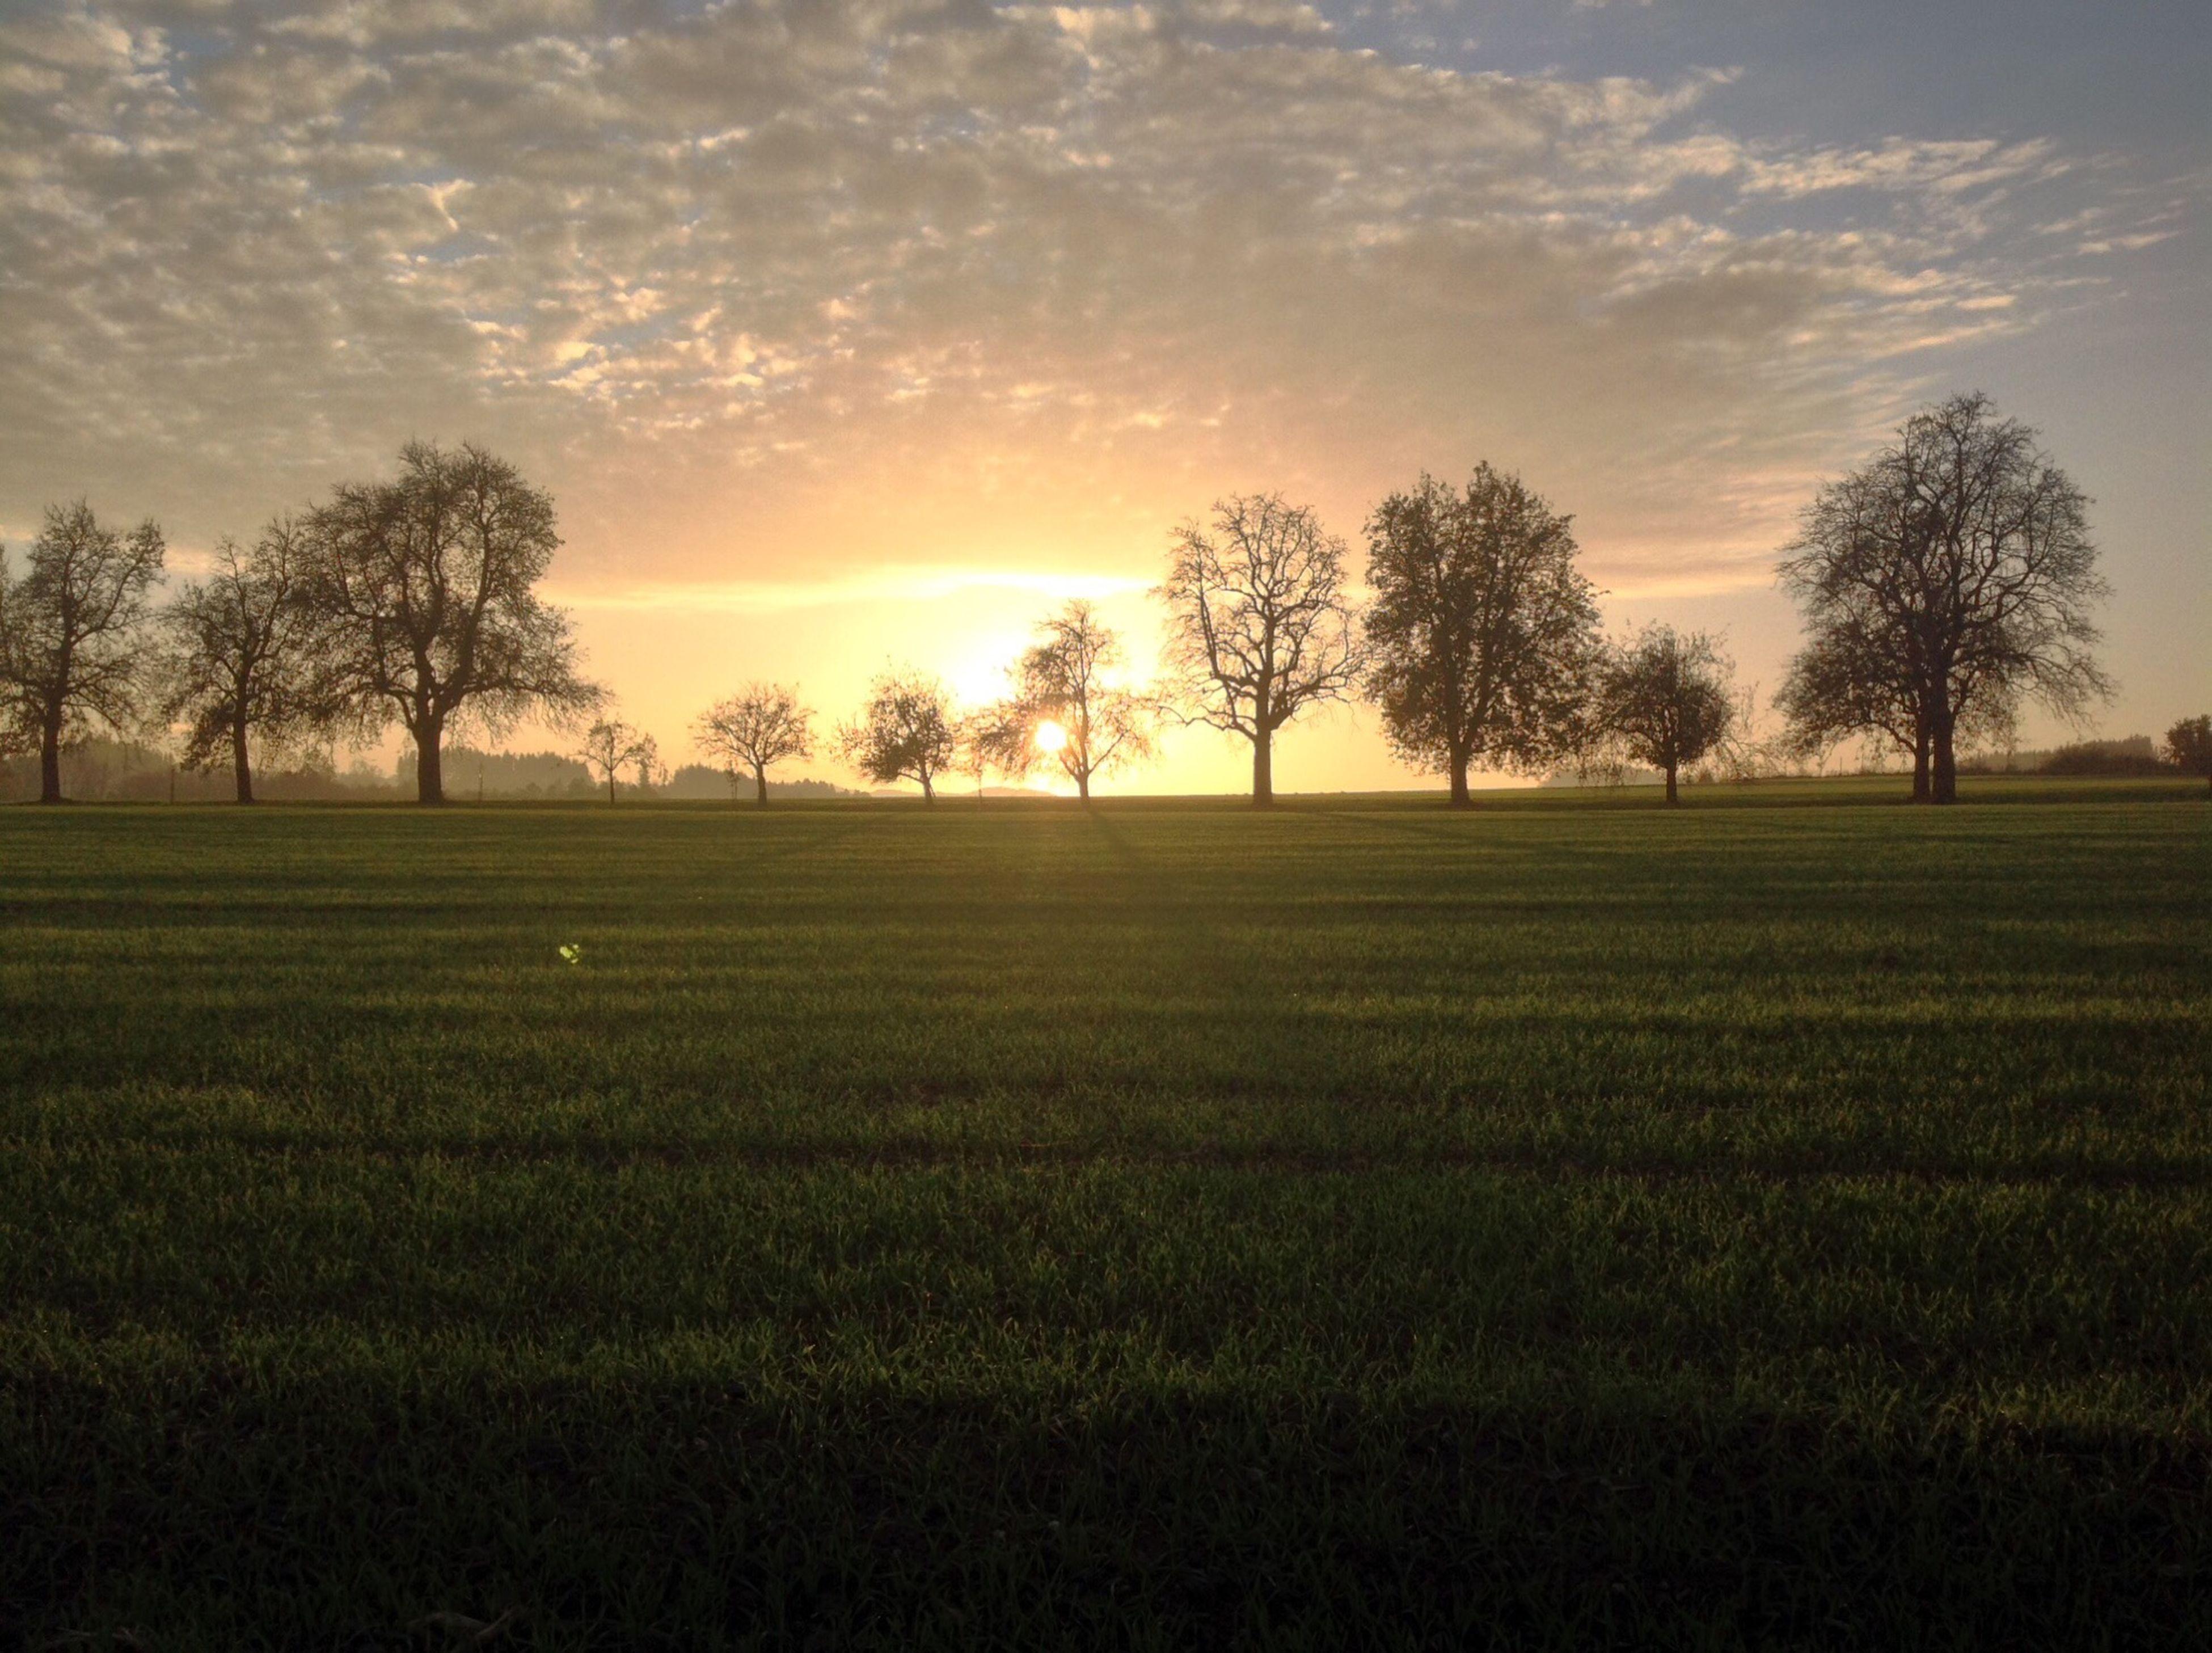 sunset, field, tree, tranquil scene, tranquility, landscape, scenics, sky, beauty in nature, grass, nature, growth, grassy, silhouette, sun, idyllic, rural scene, cloud - sky, orange color, sunlight